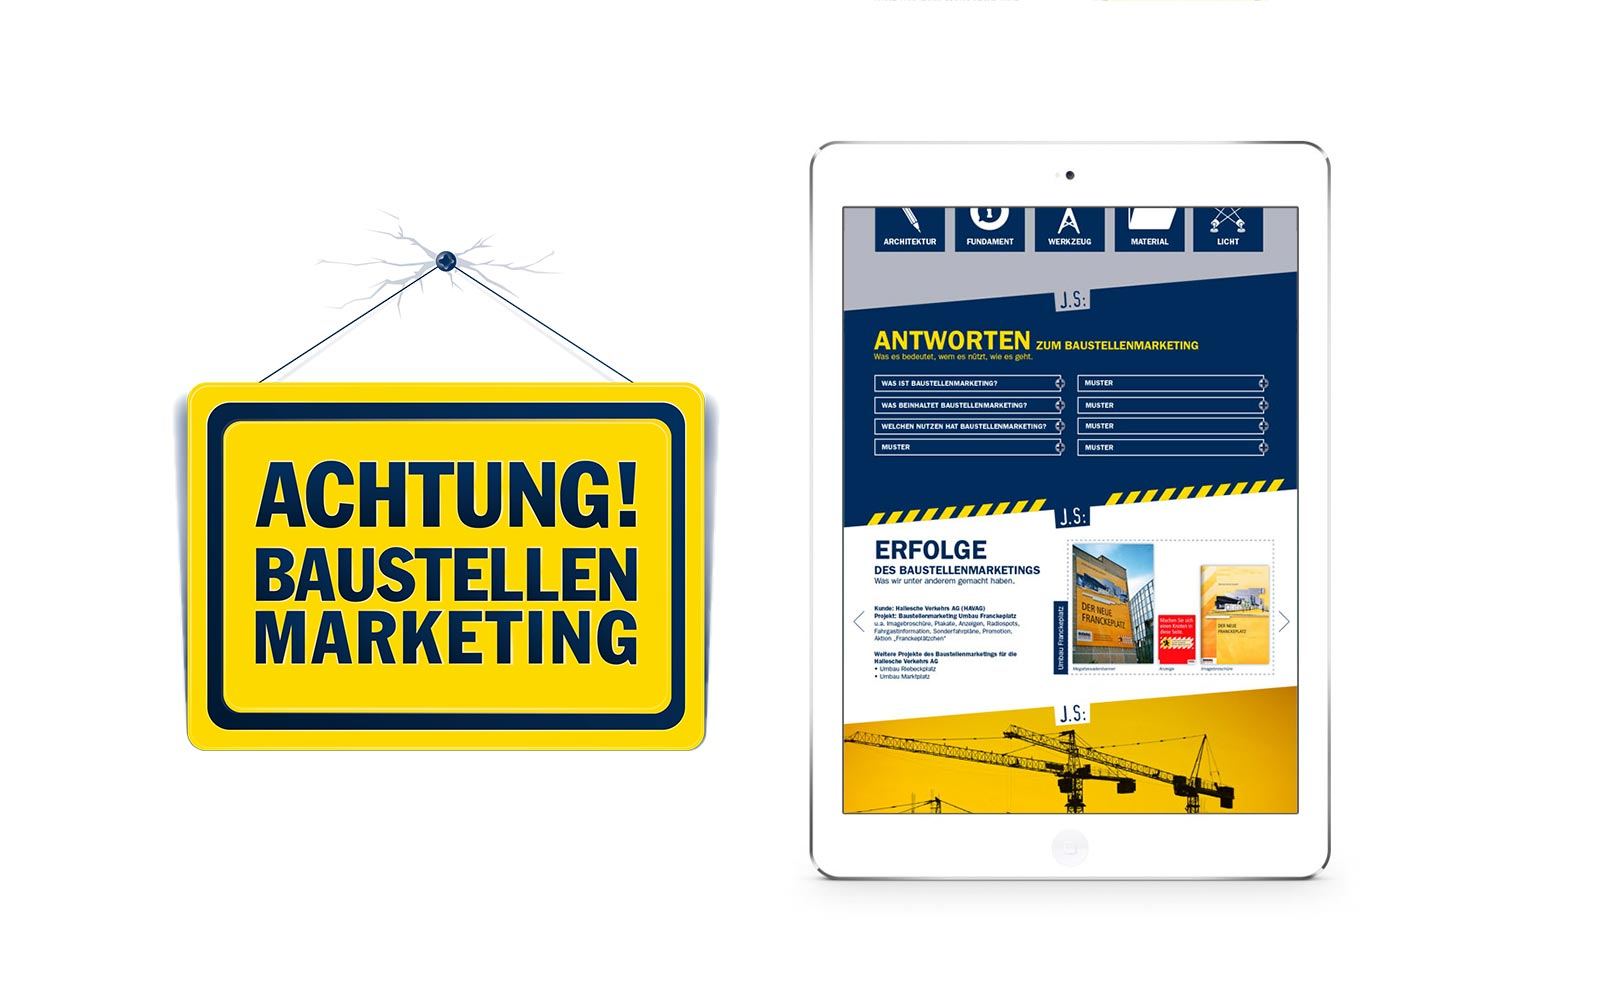 kathrin, krasselt, mediendesign, grafik, grafiker, leipzig, werbung, webdesign, logo, corporate, design, baustelle